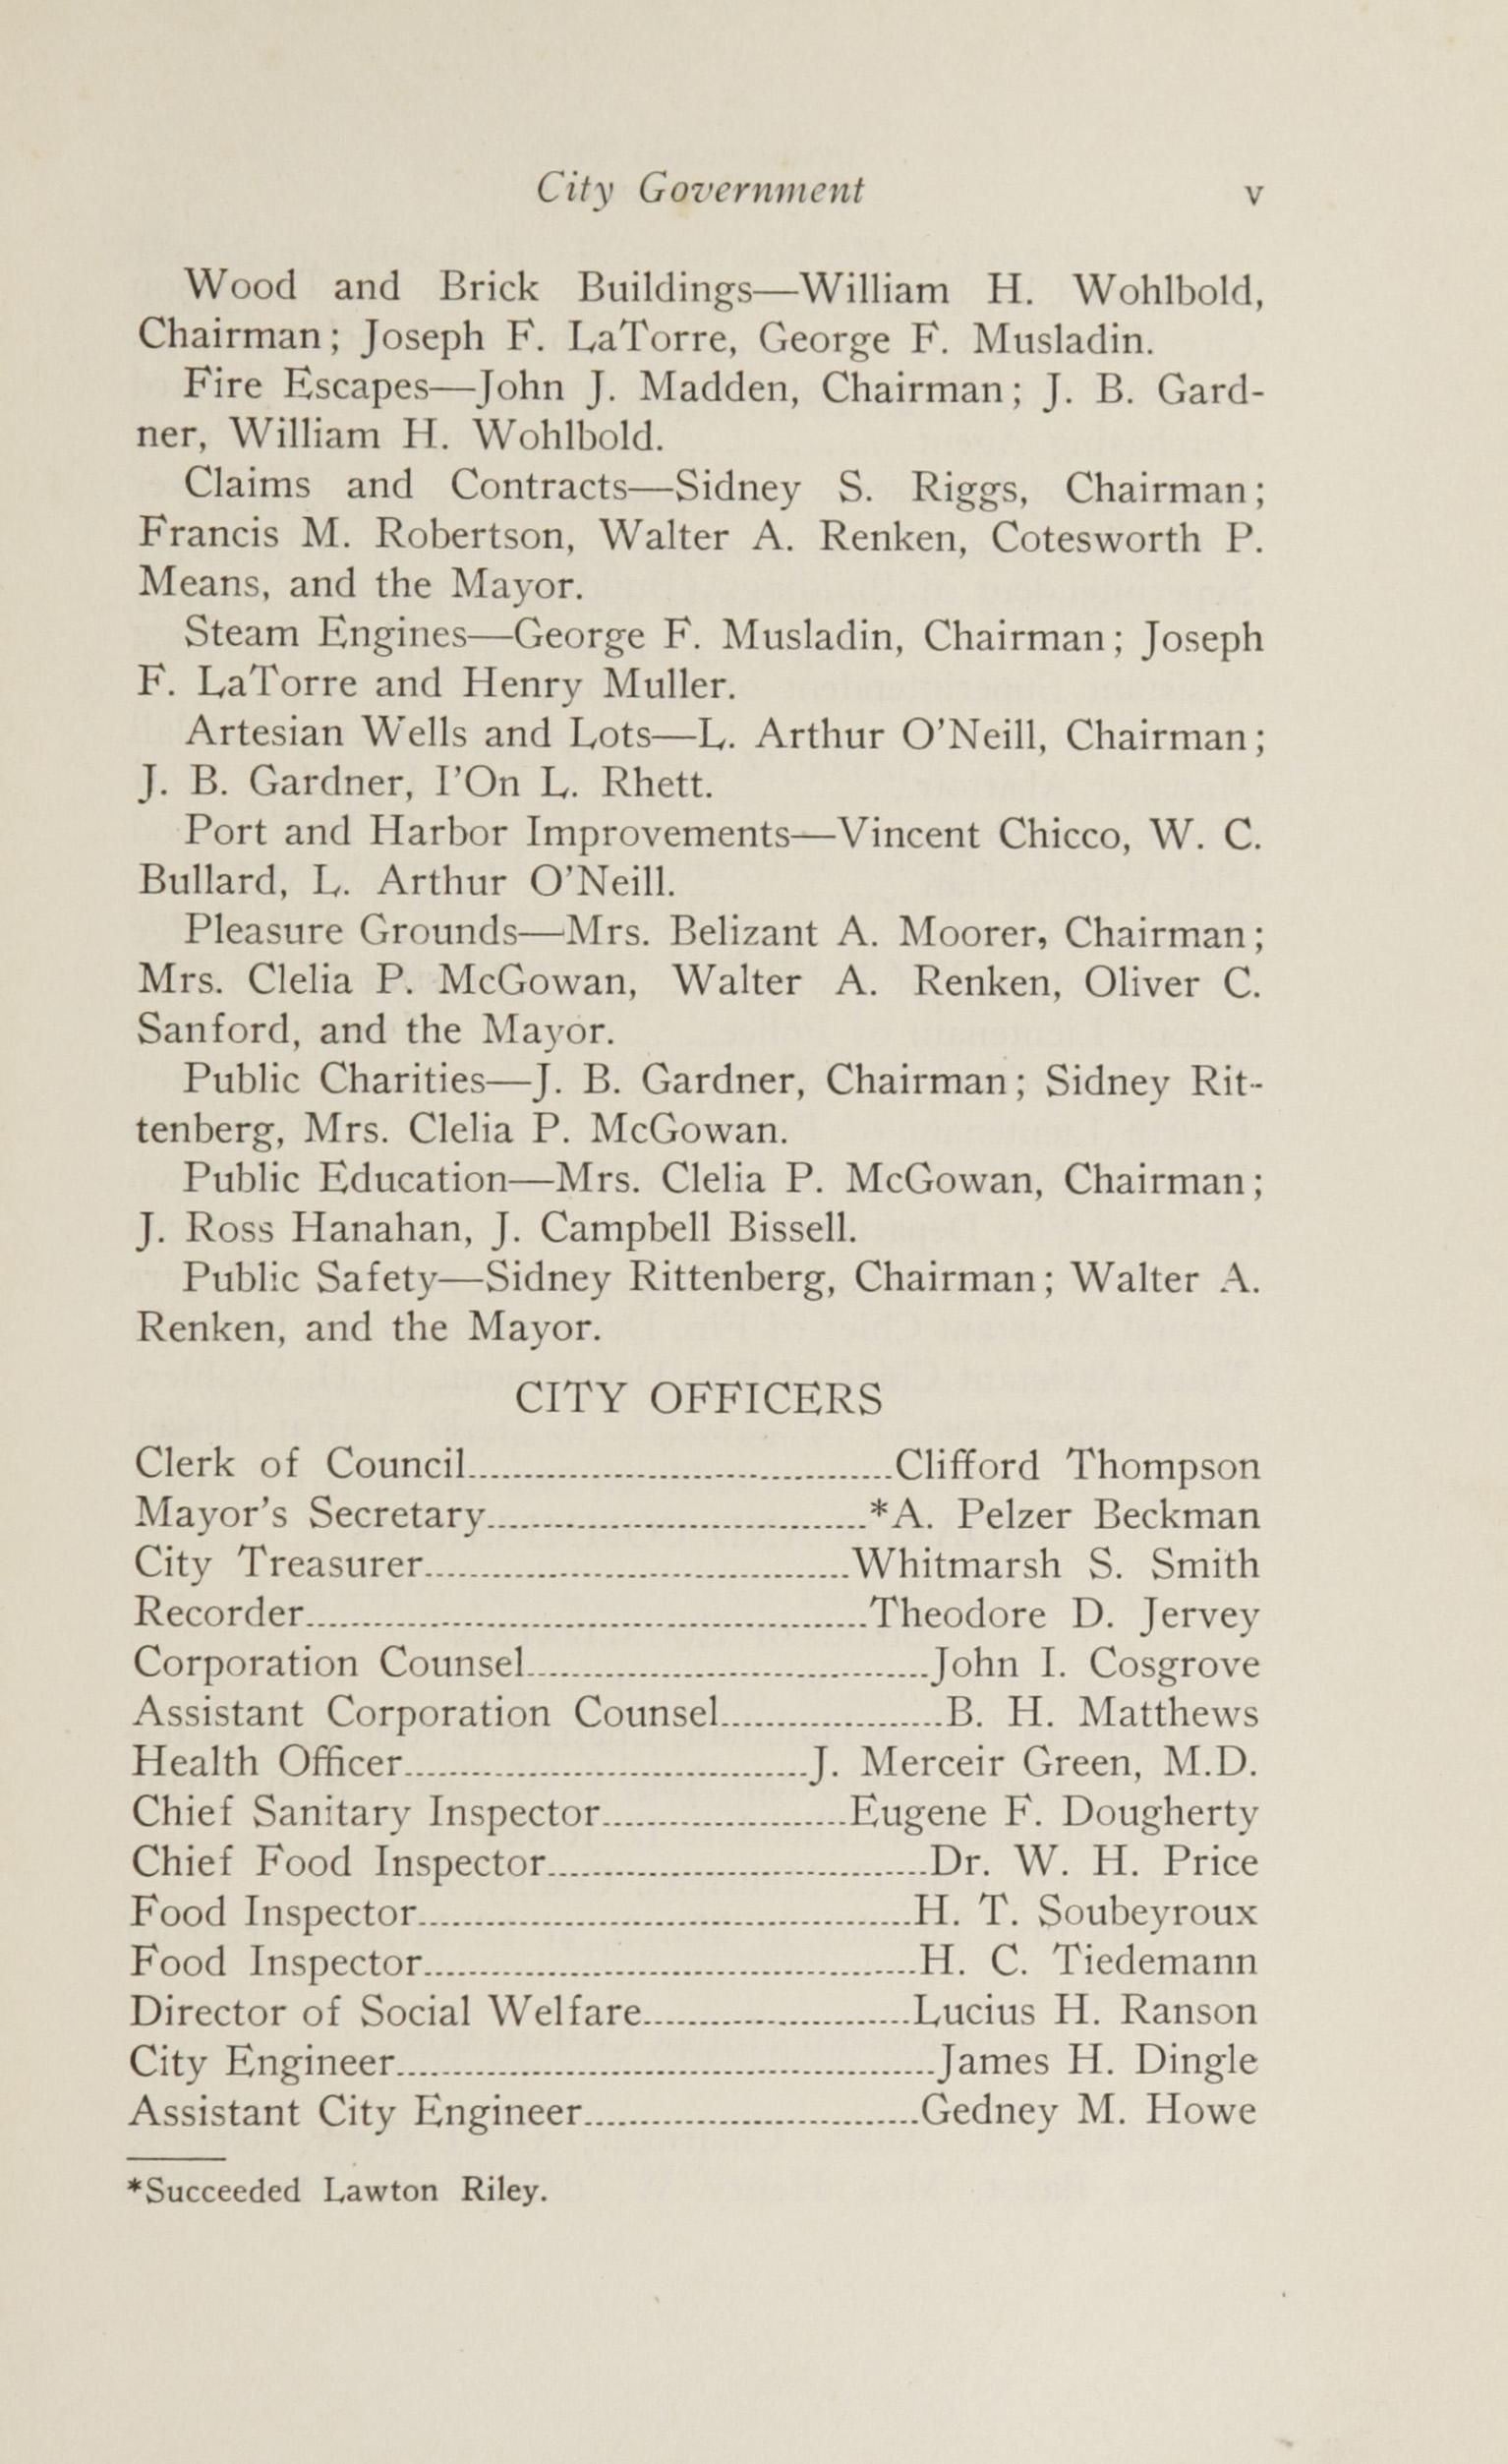 Charleston Yearbook, 1924, page v